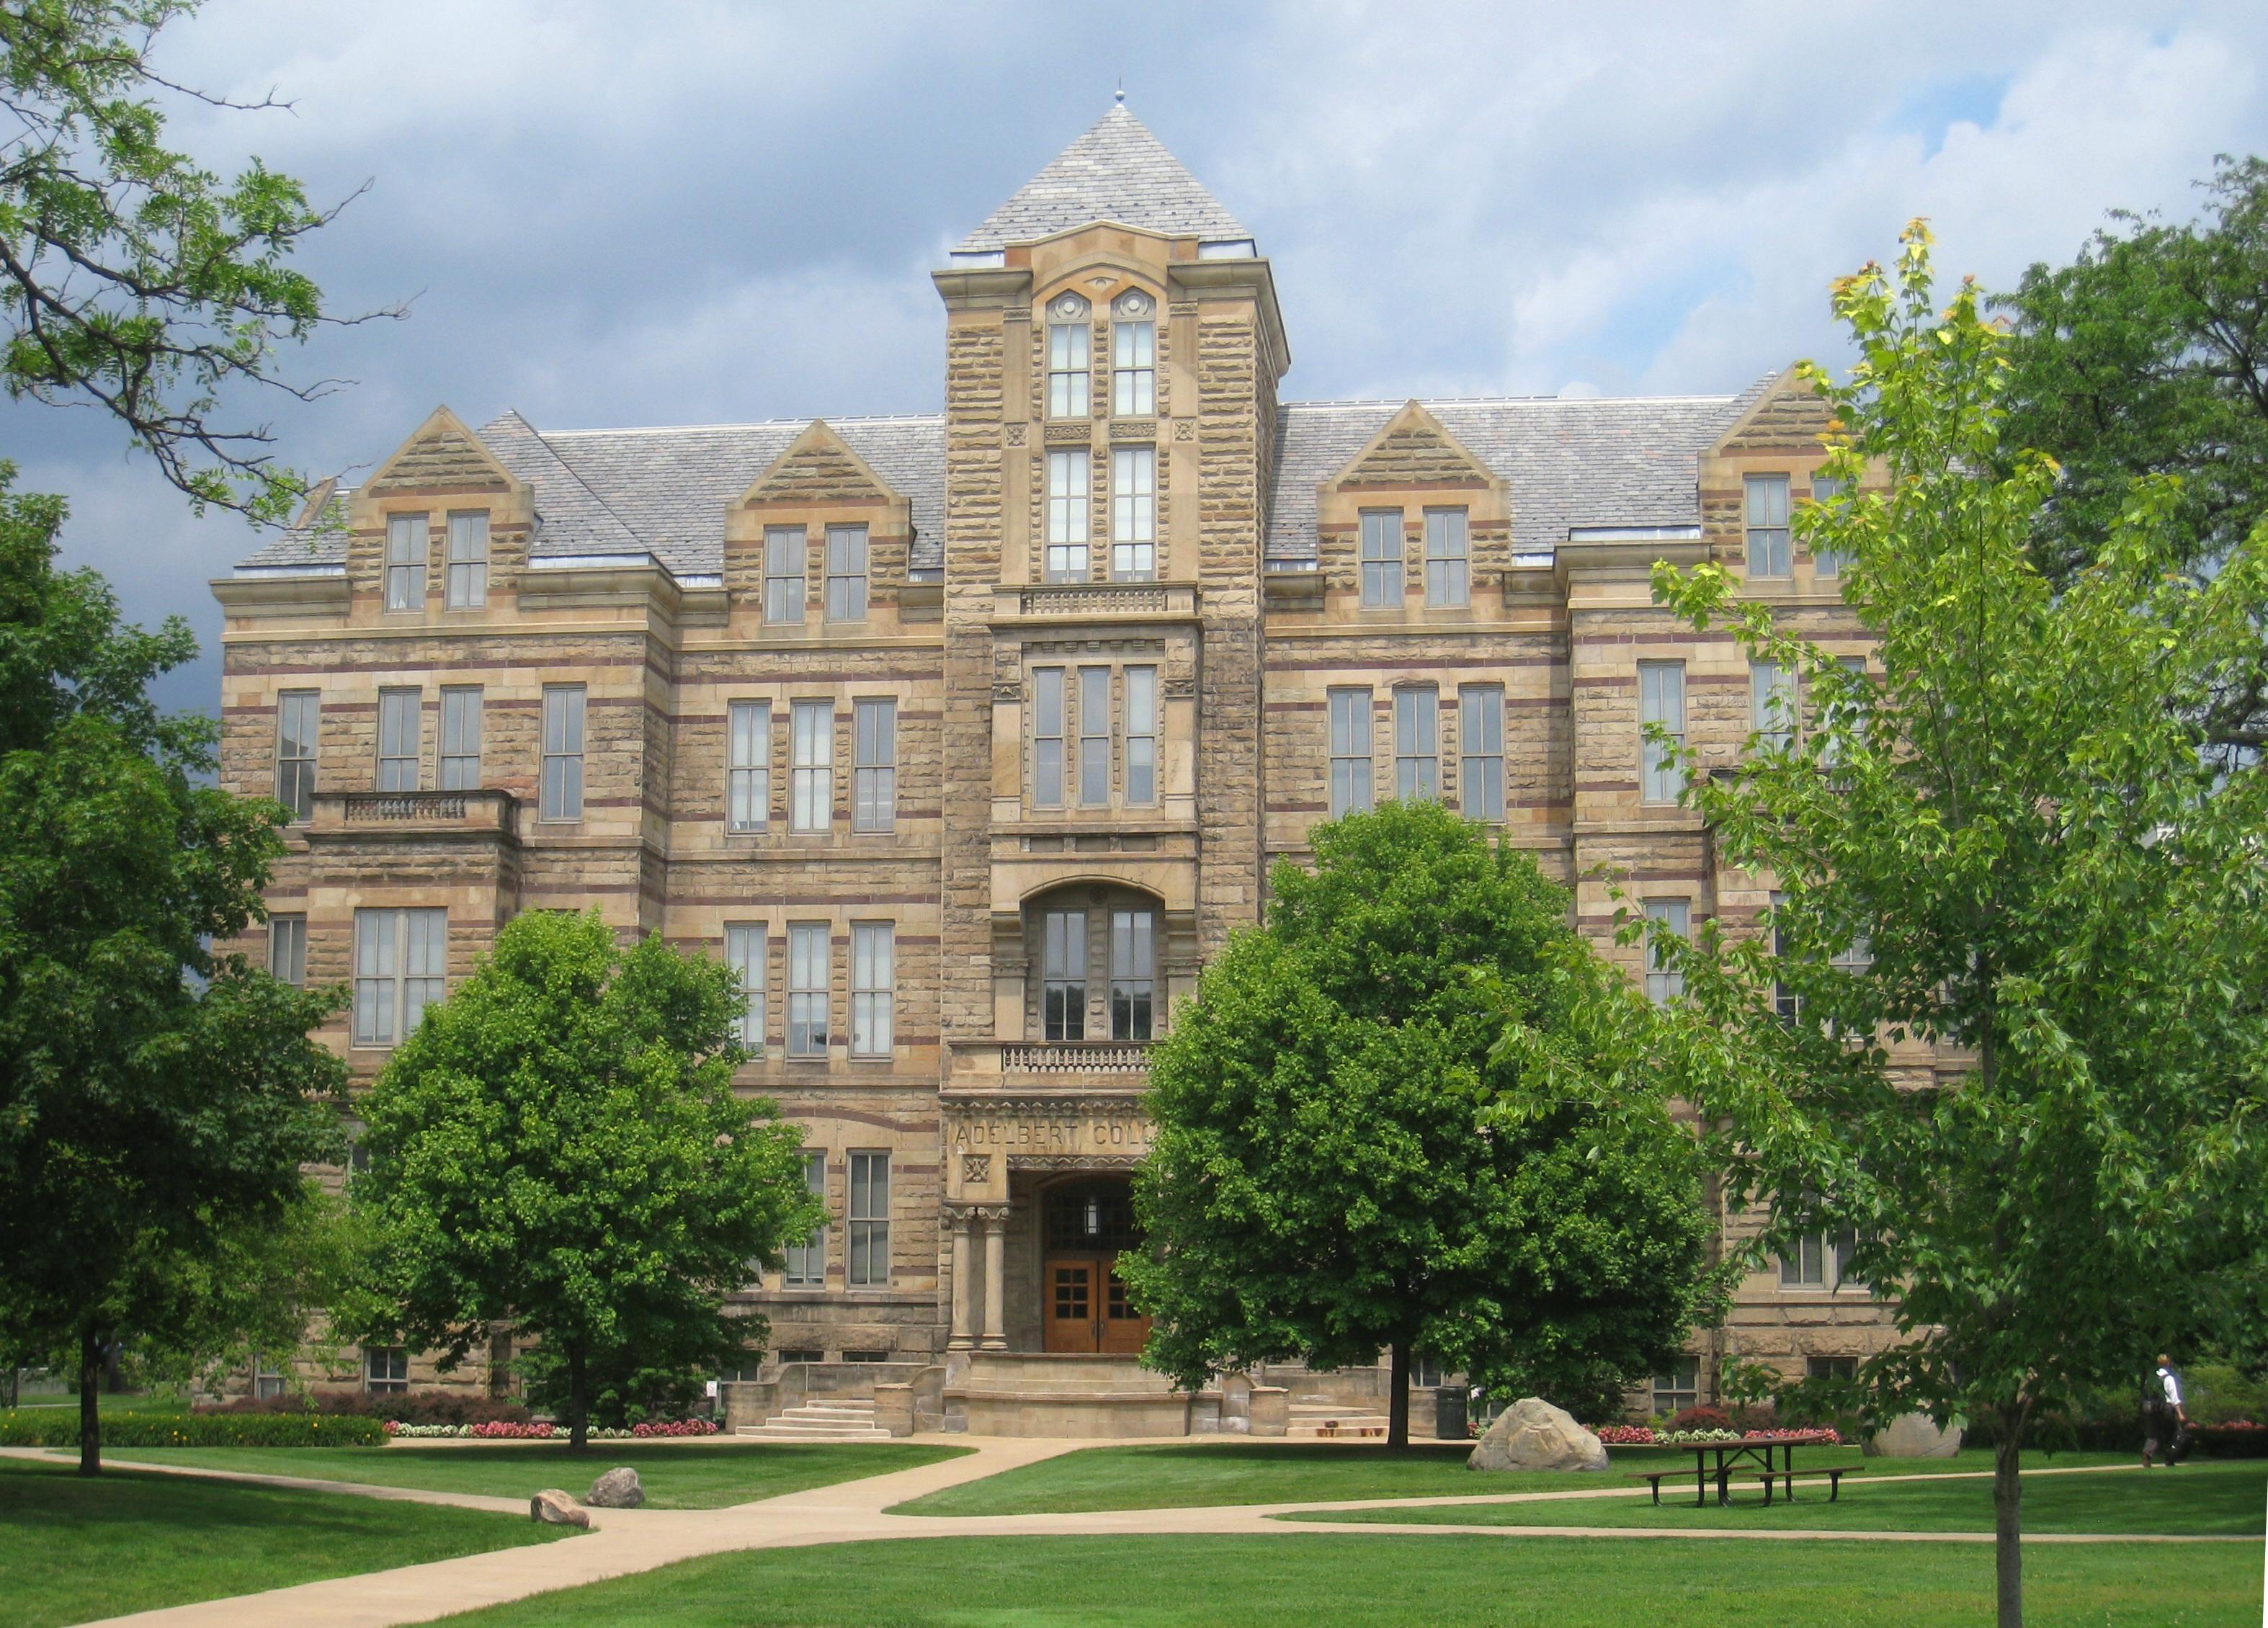 Description adelbert hall case western reserve university